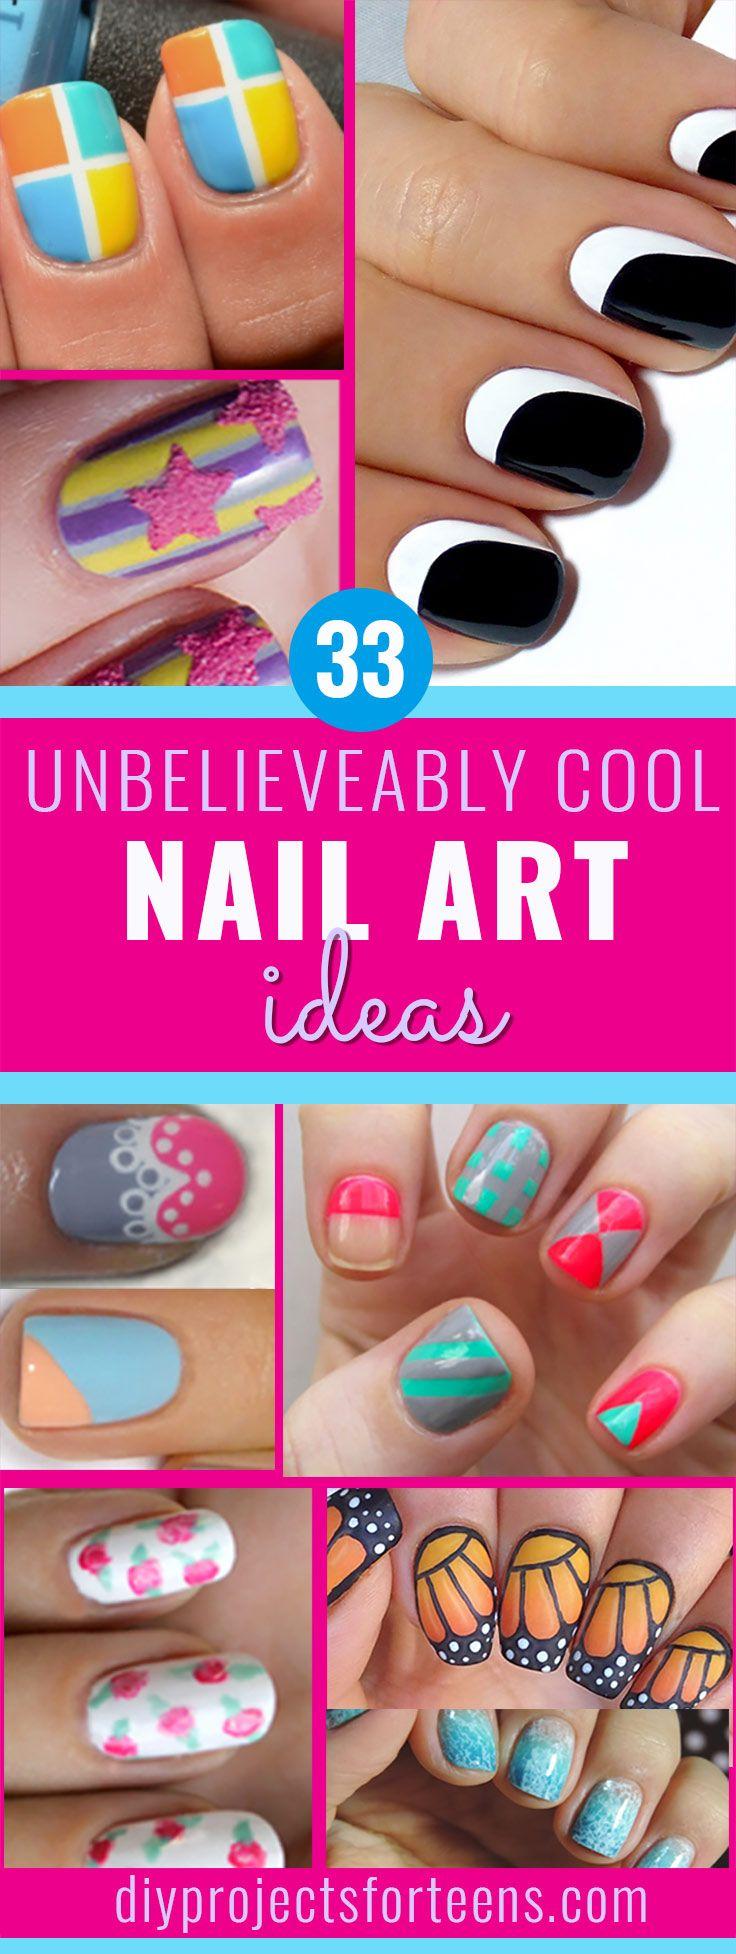 33 unbelievably cool nail art ideas | teen, tutorials and makeup